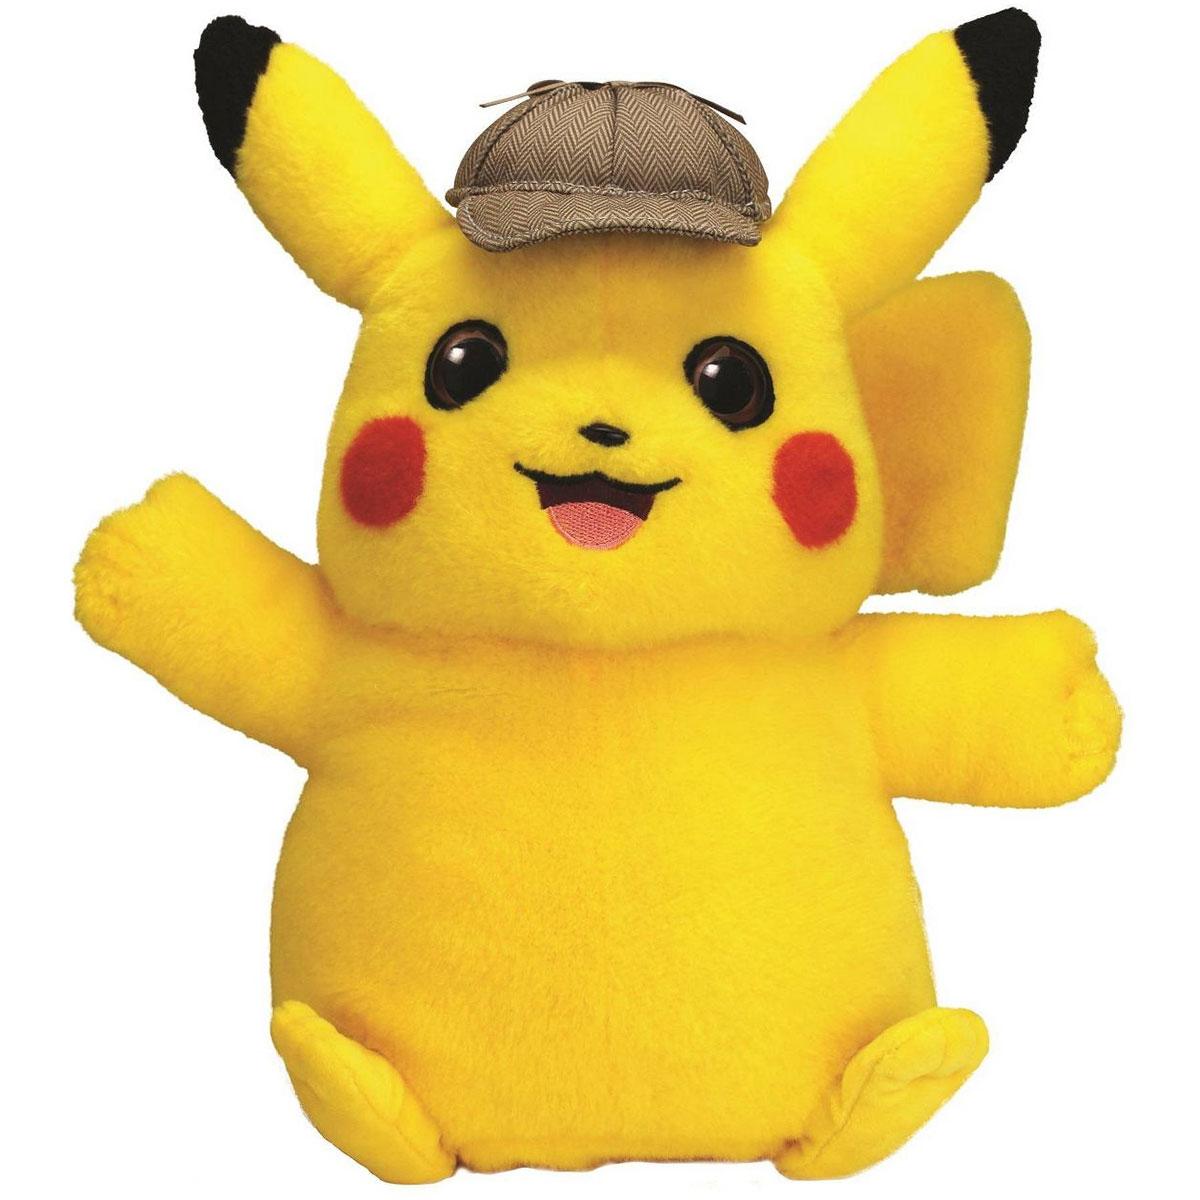 Pokémon Detective Pikachu Talking Plush